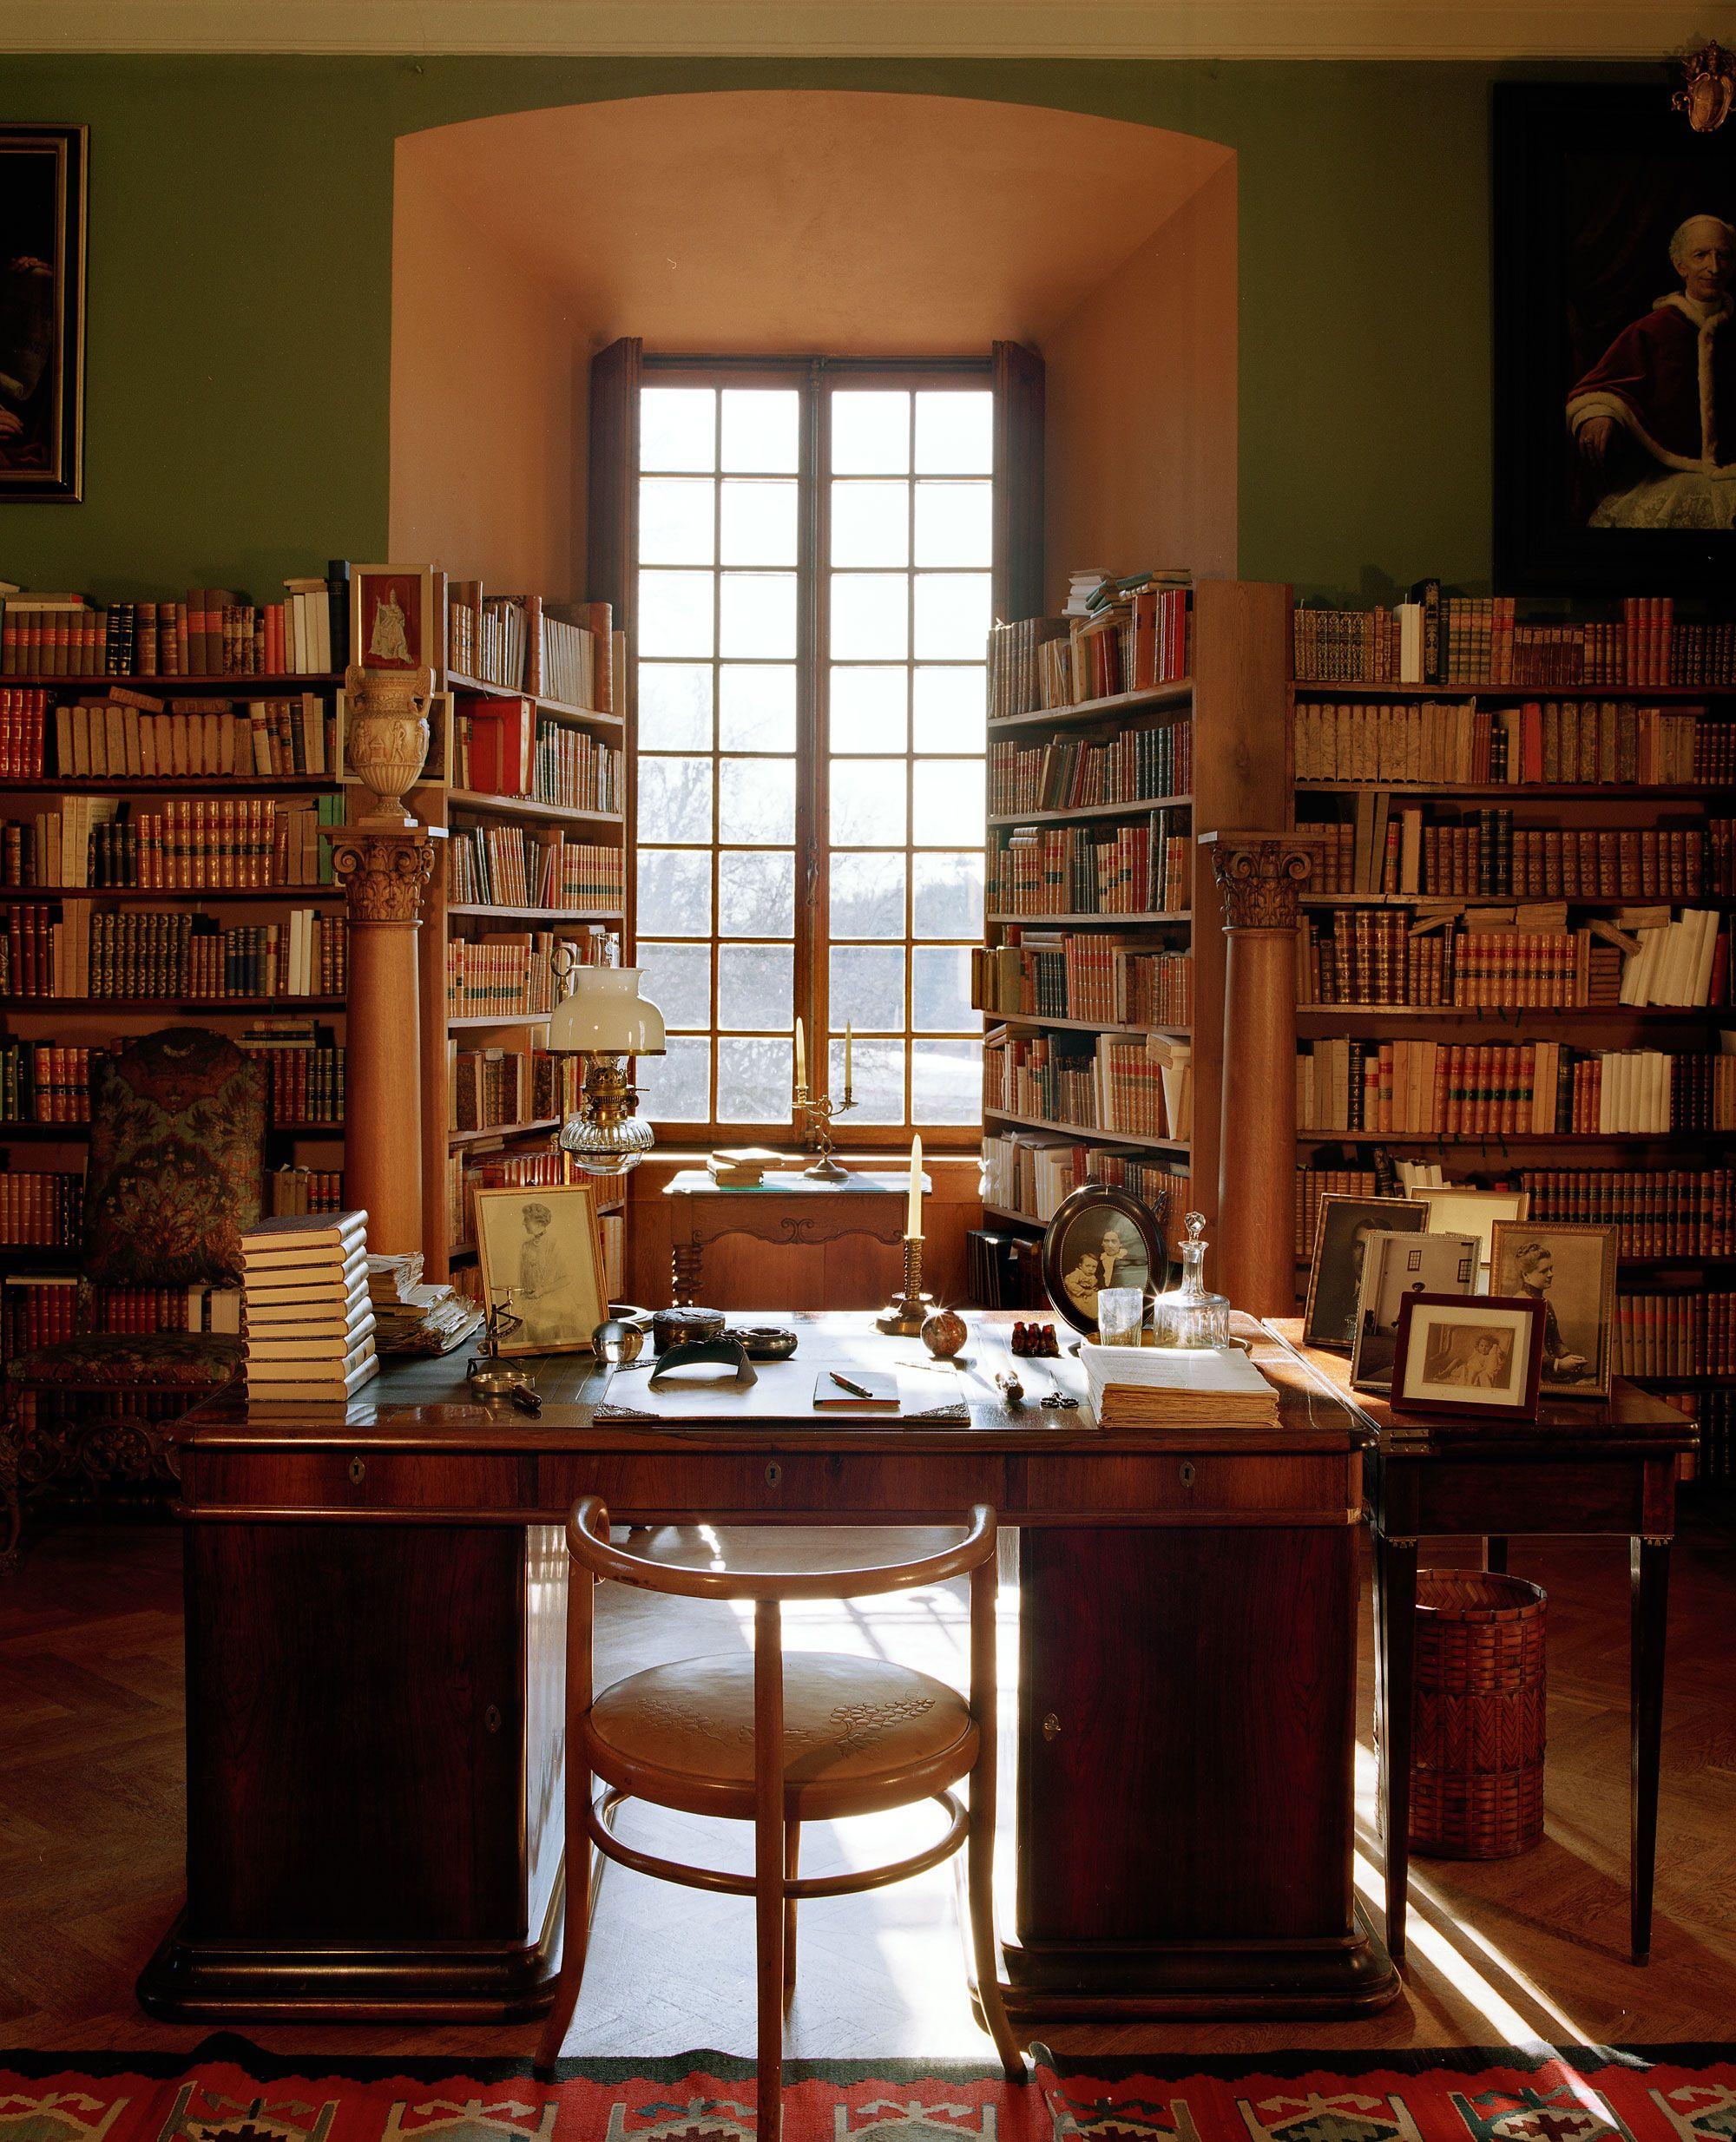 Cozy Study Room Ideas: Tyresö Slott (Castle), Sweden - The Library.